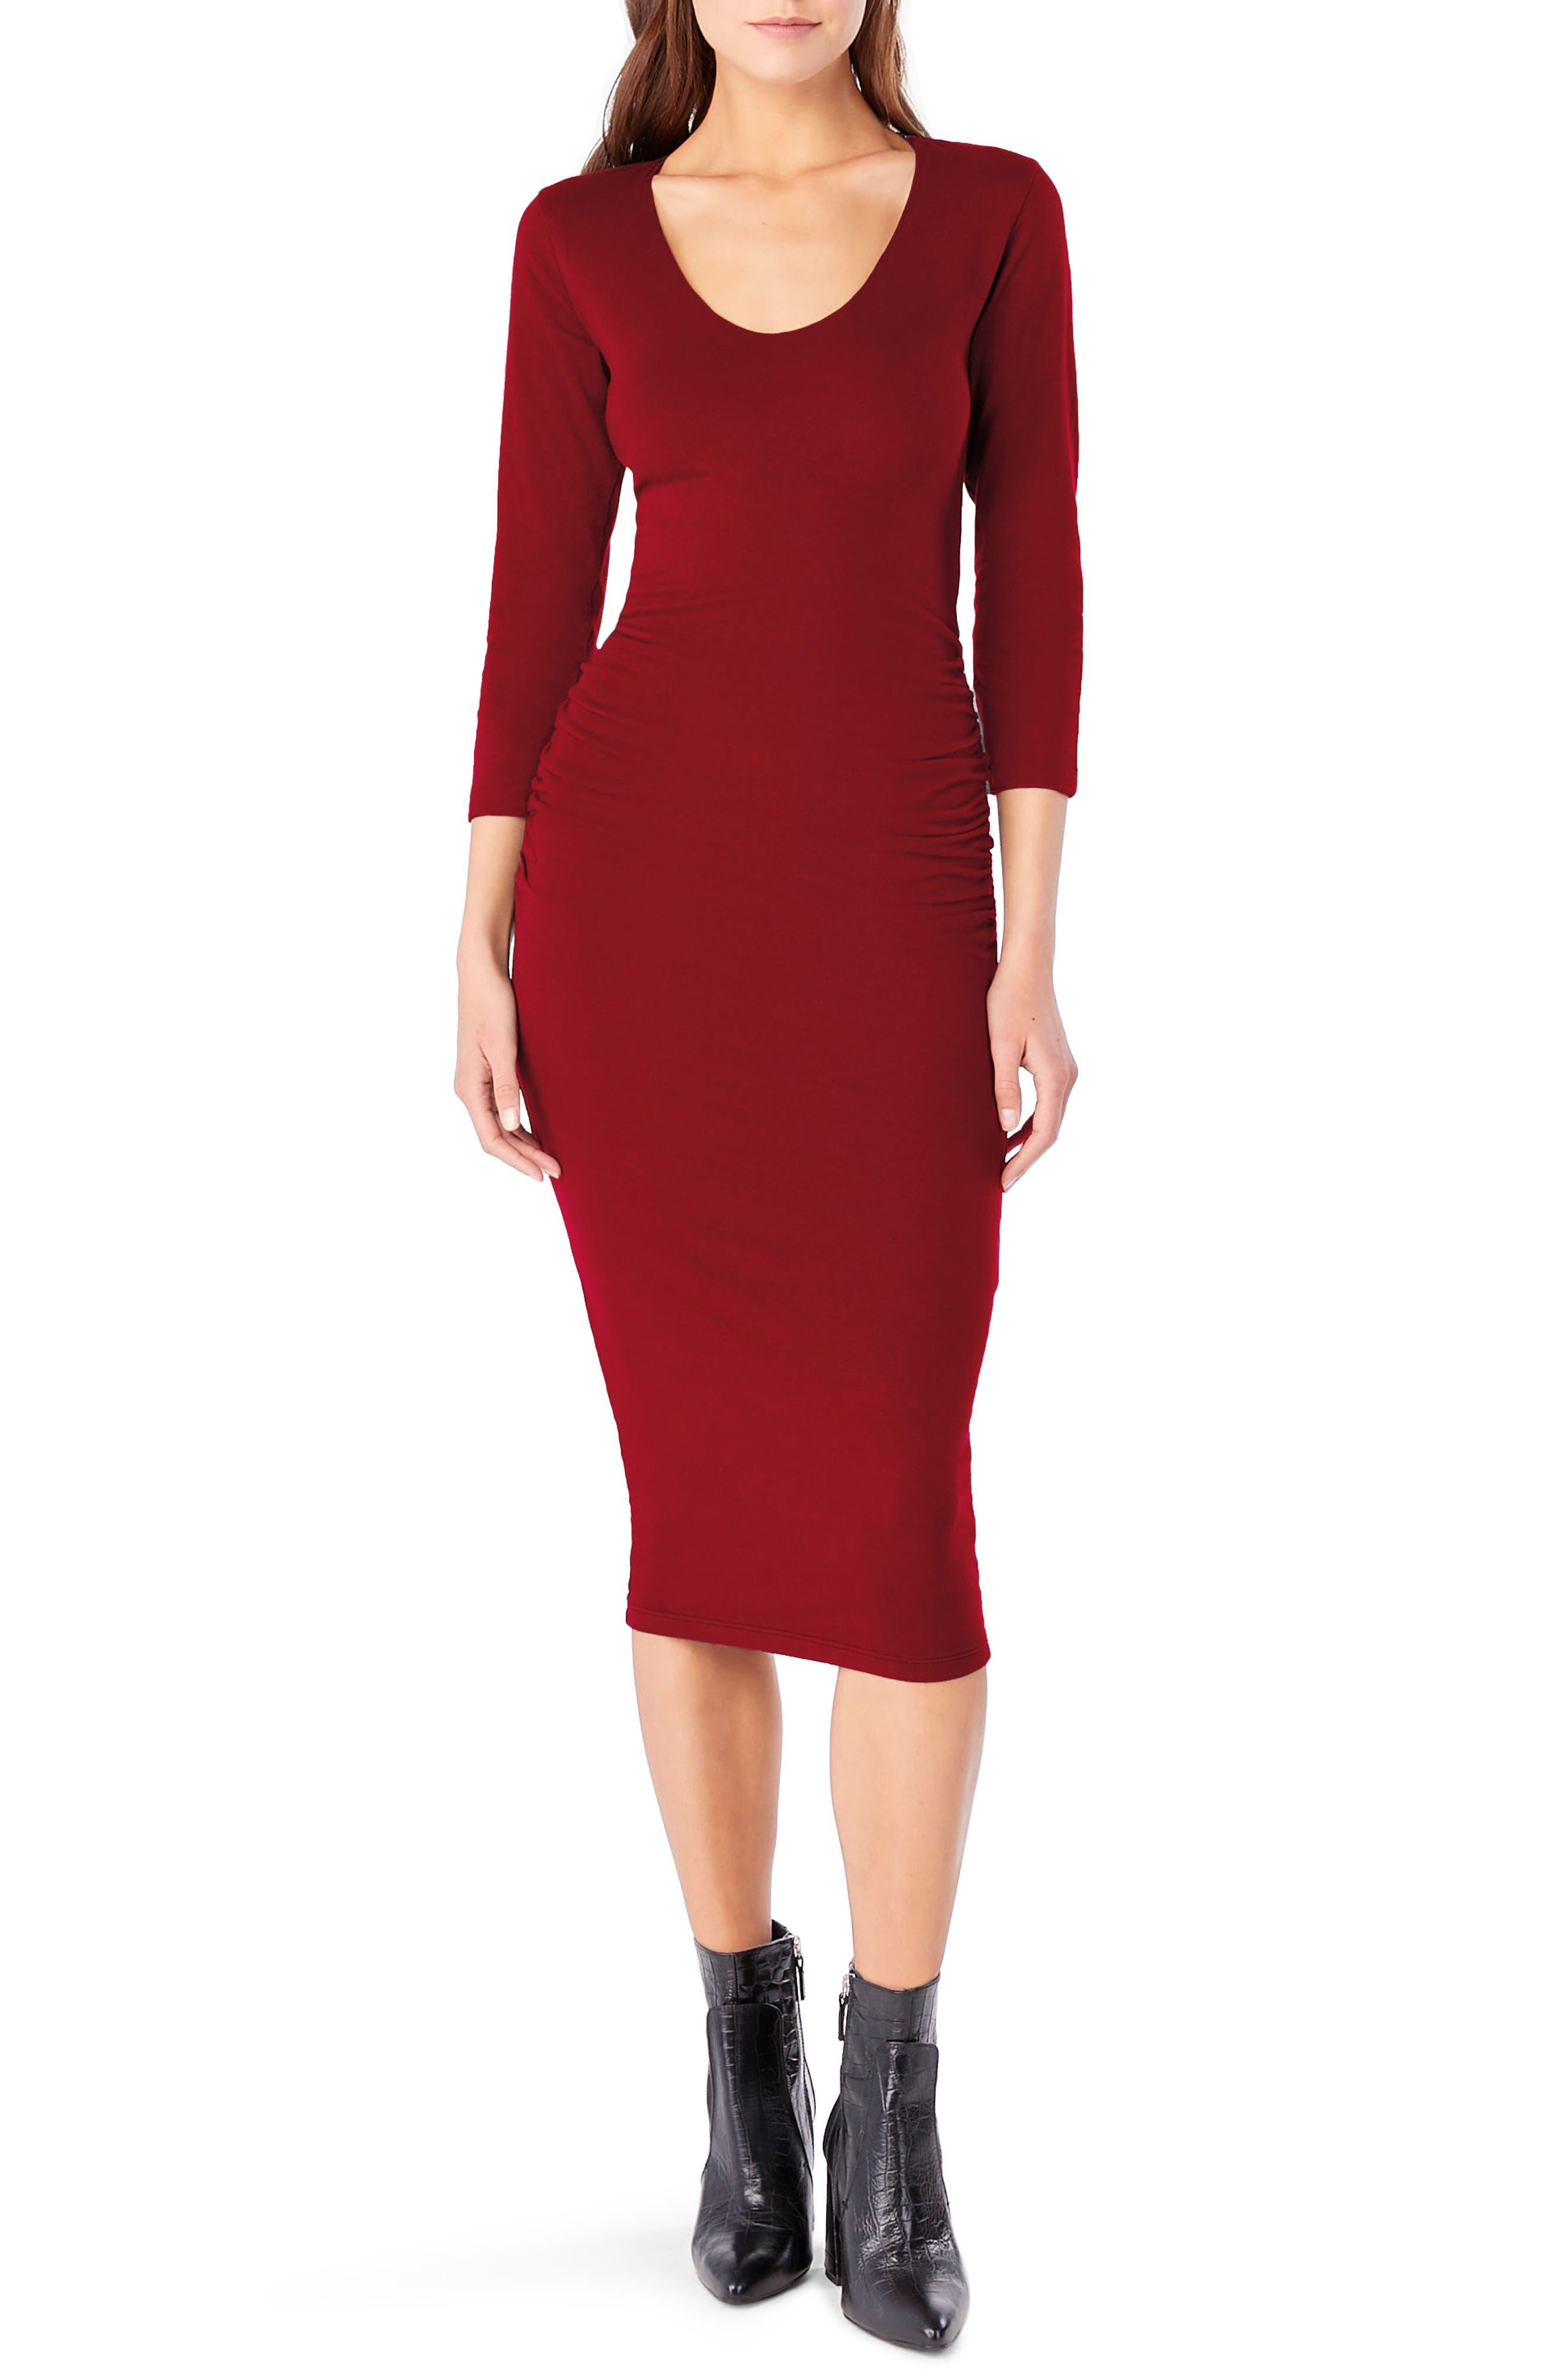 Alternate Image 1 Selected - Michael Stars Ruched Midi Dress (Regular & Petite)